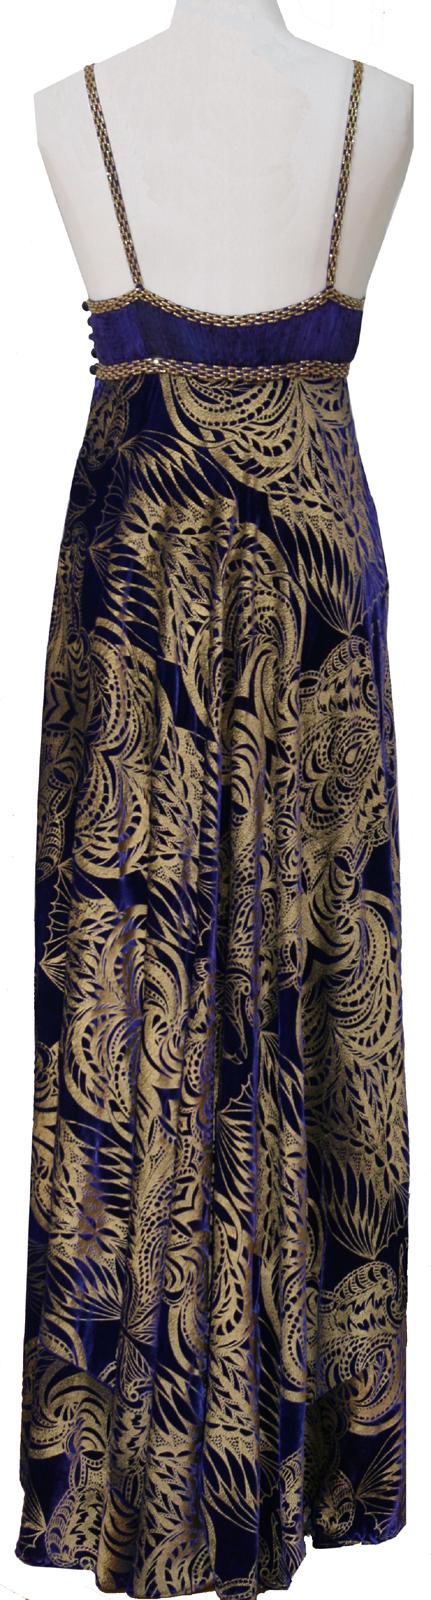 Lucinda Dress-5988